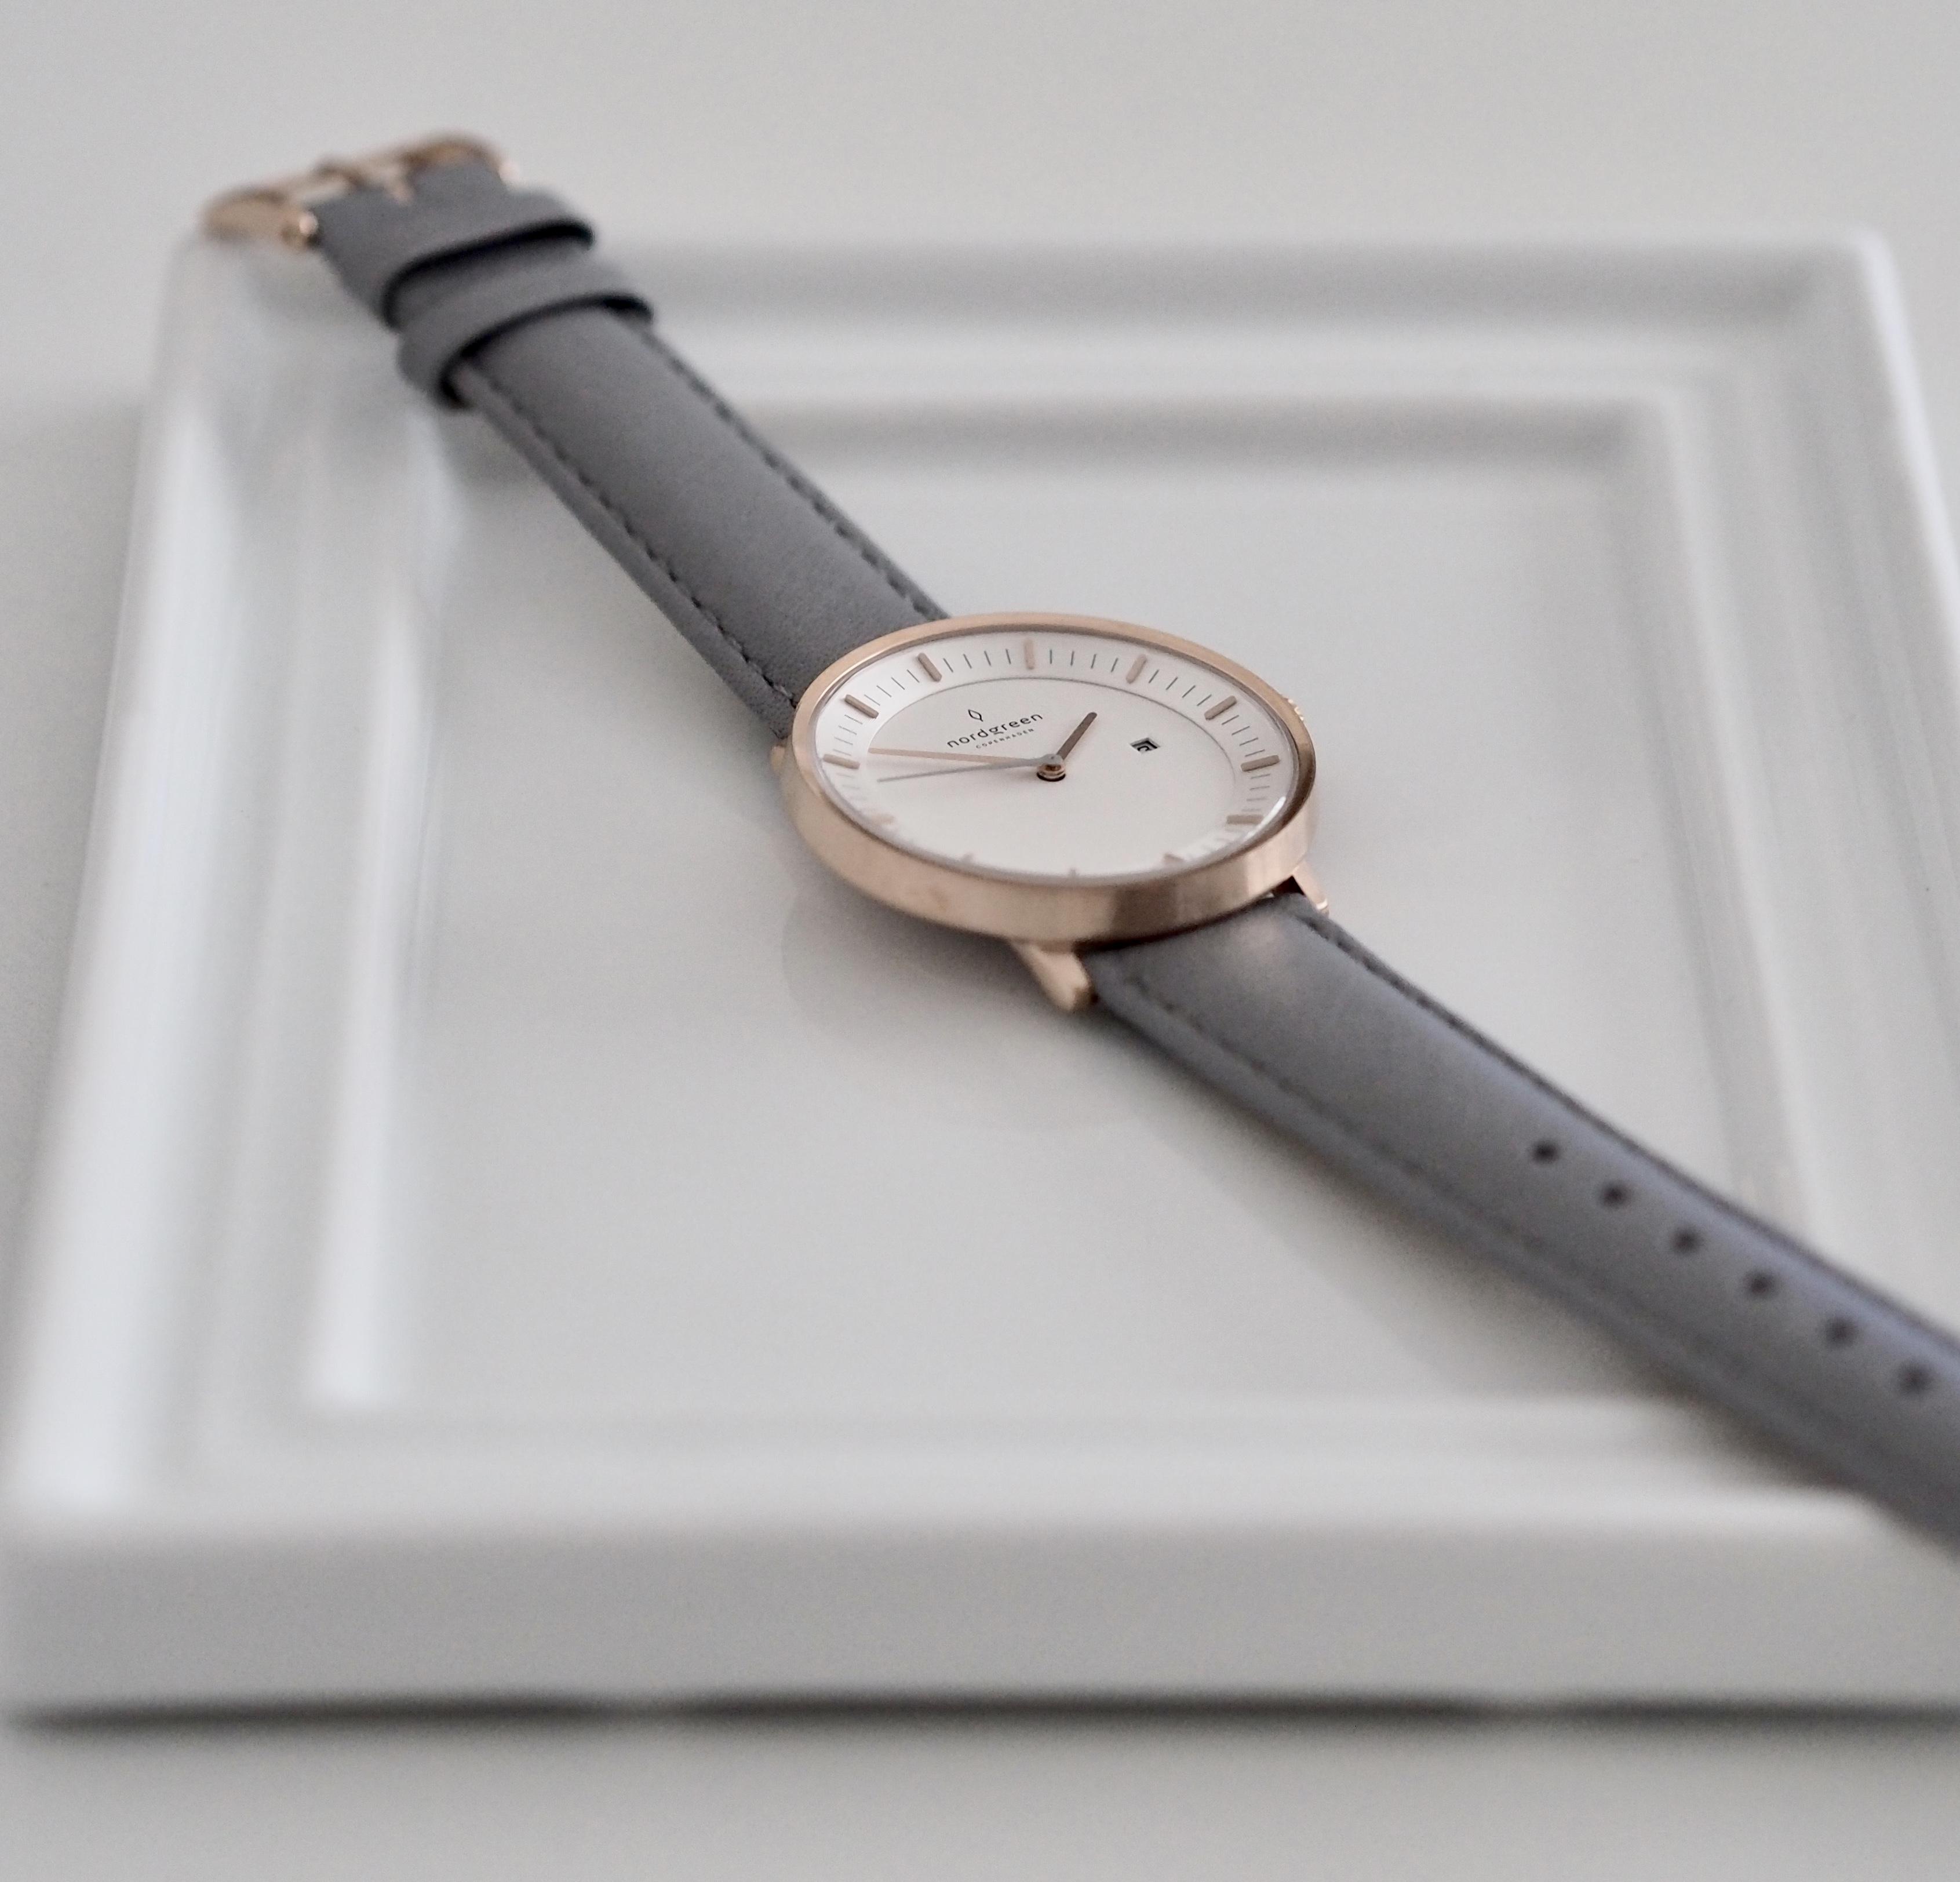 nordgreen(ノードグリーン)25%割引クーポンあり*評判の北欧腕時計がおしゃれ♪